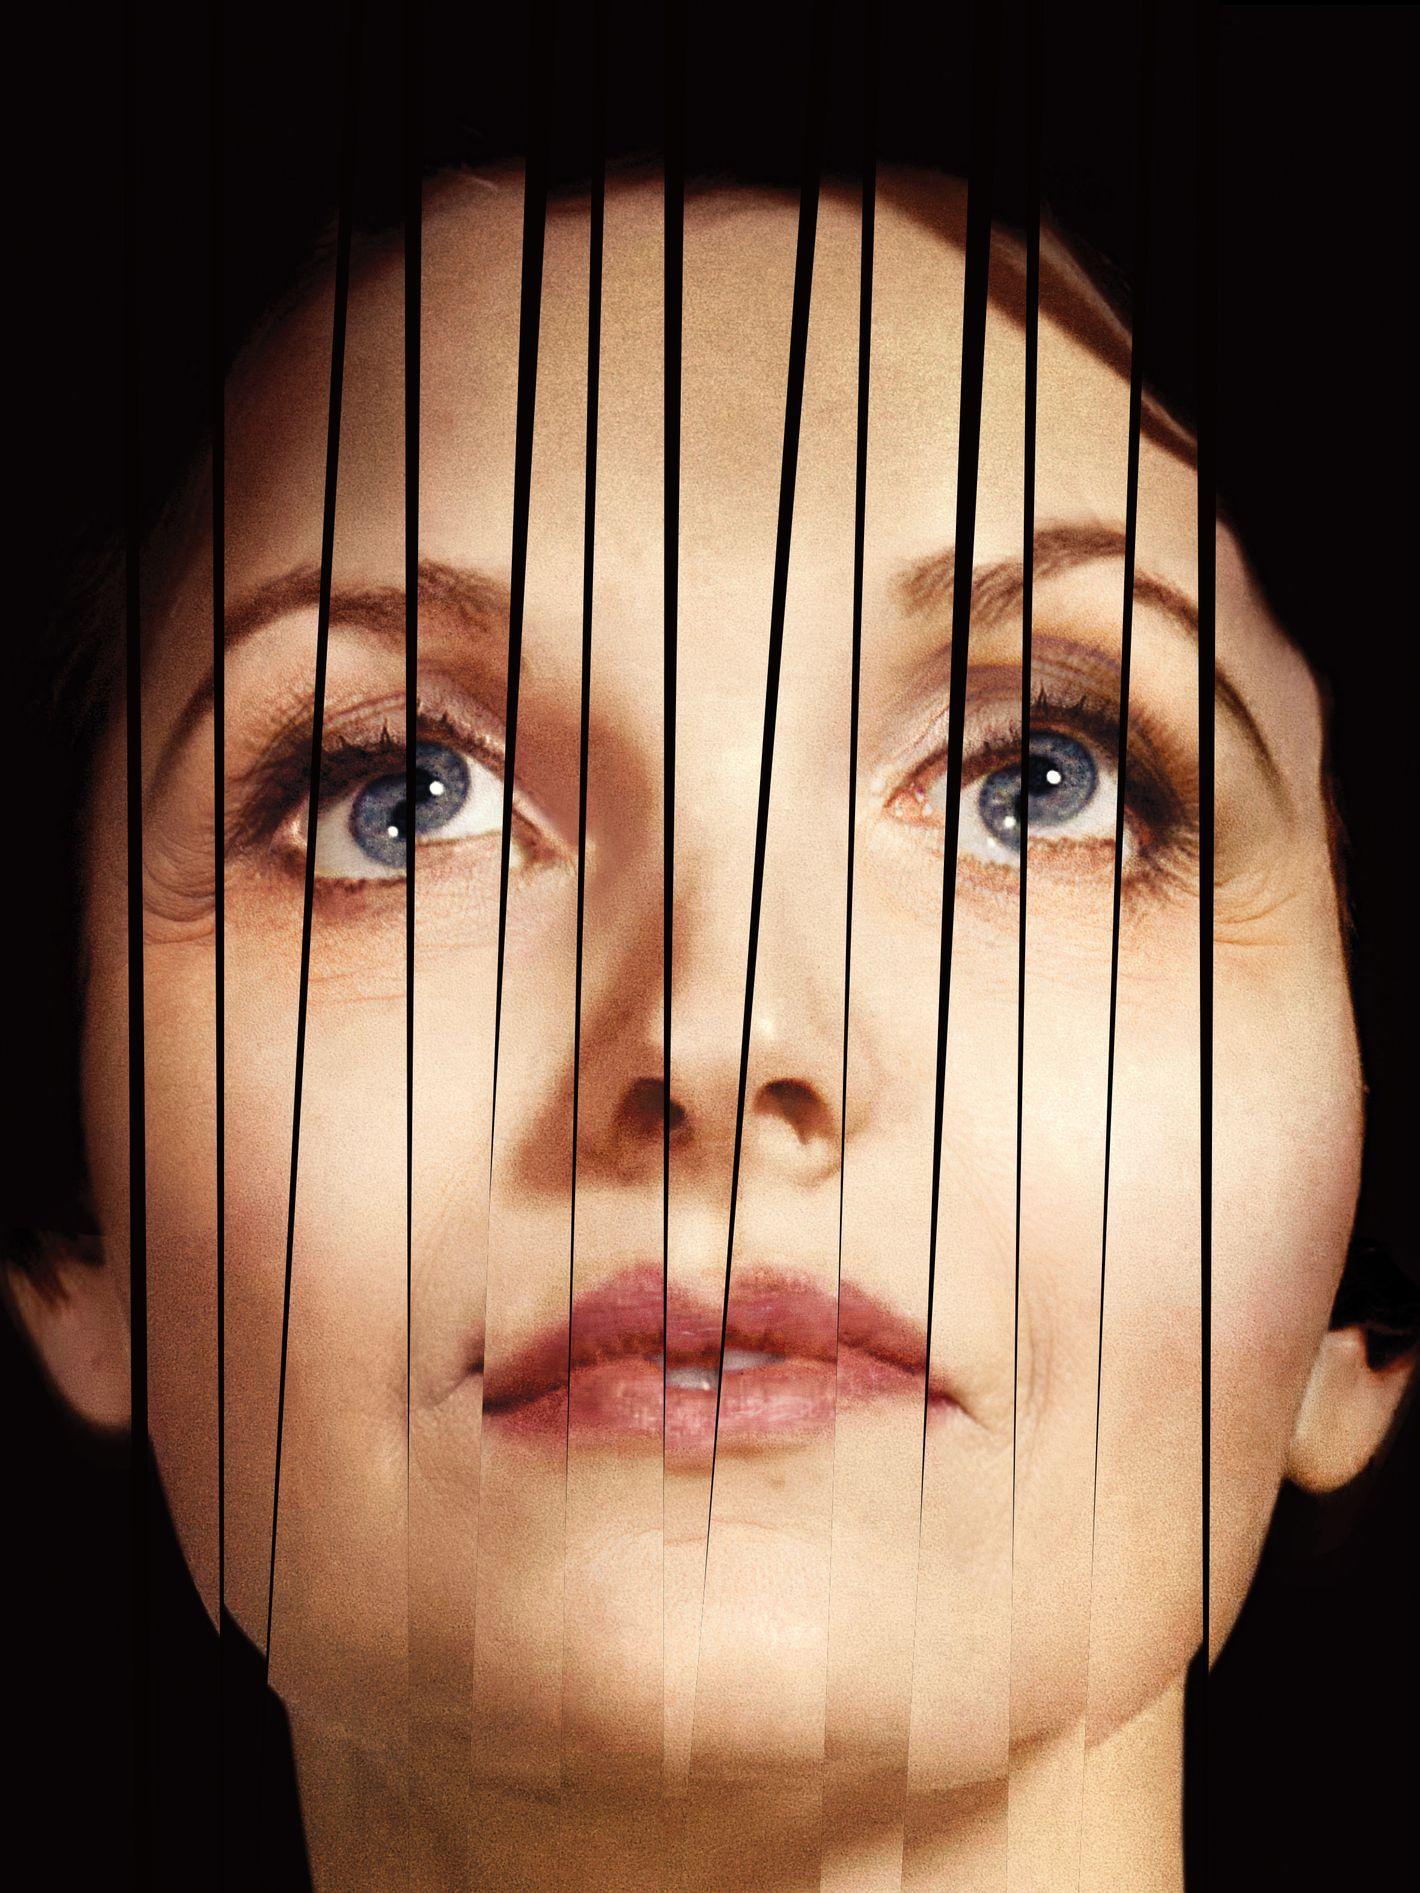 Is Estrogen the Key to Understanding Women's Mental Health?